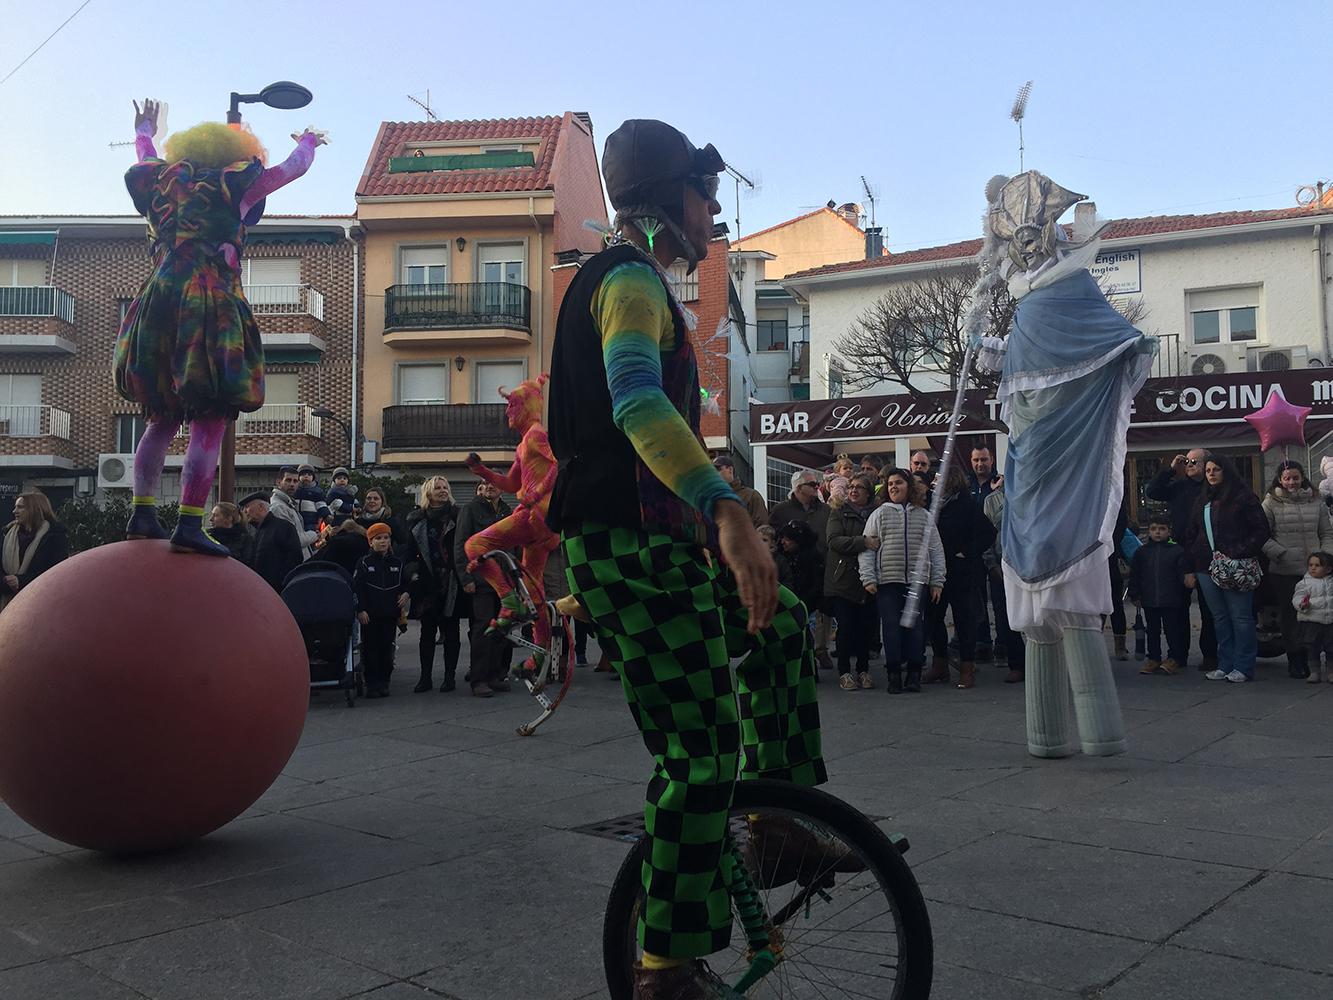 Cabalgata Reyes Magos - Funambulista